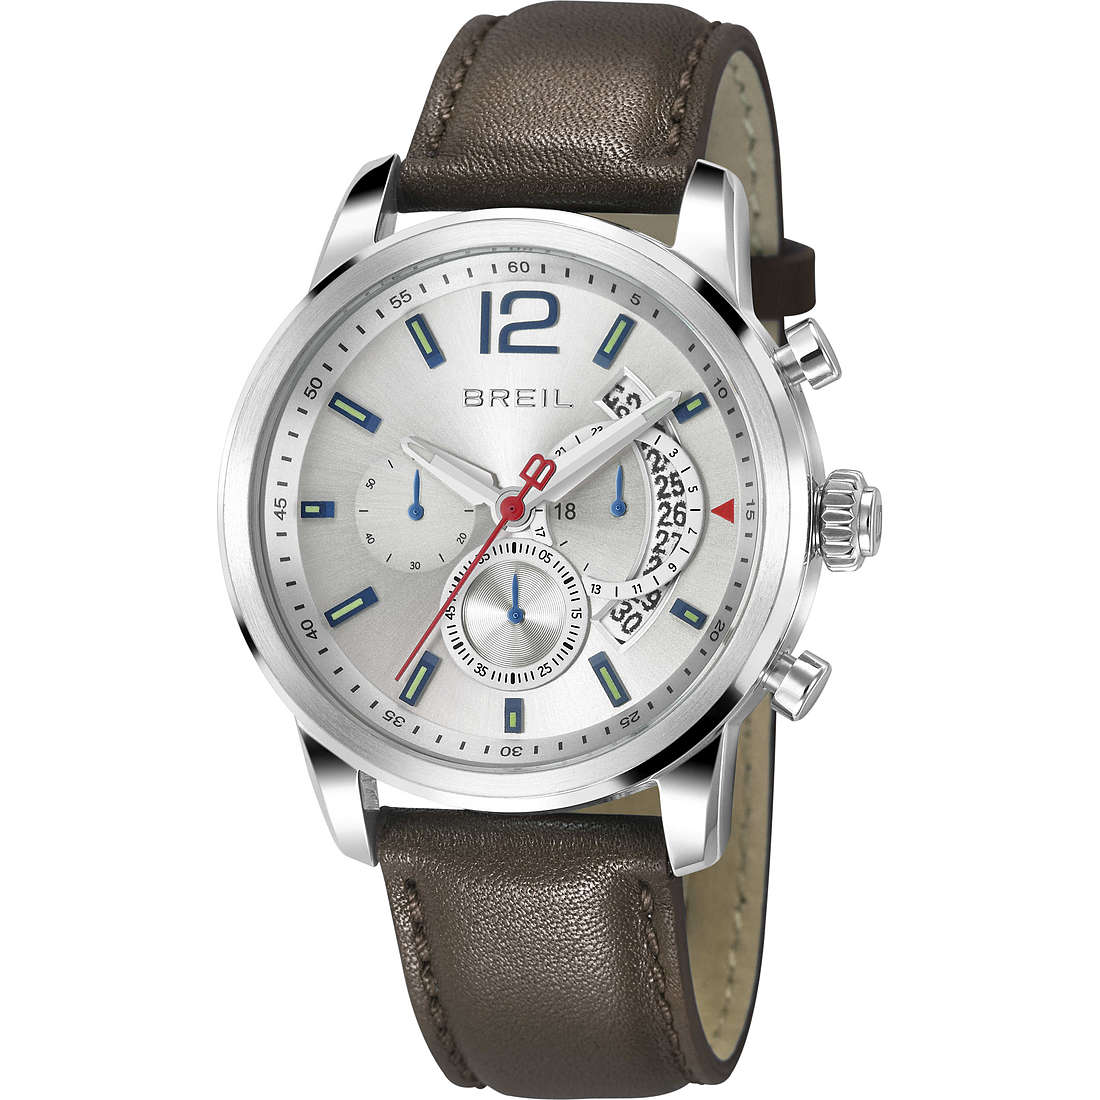 Orologio Cronografo Uomo Breil Miglia TW1372